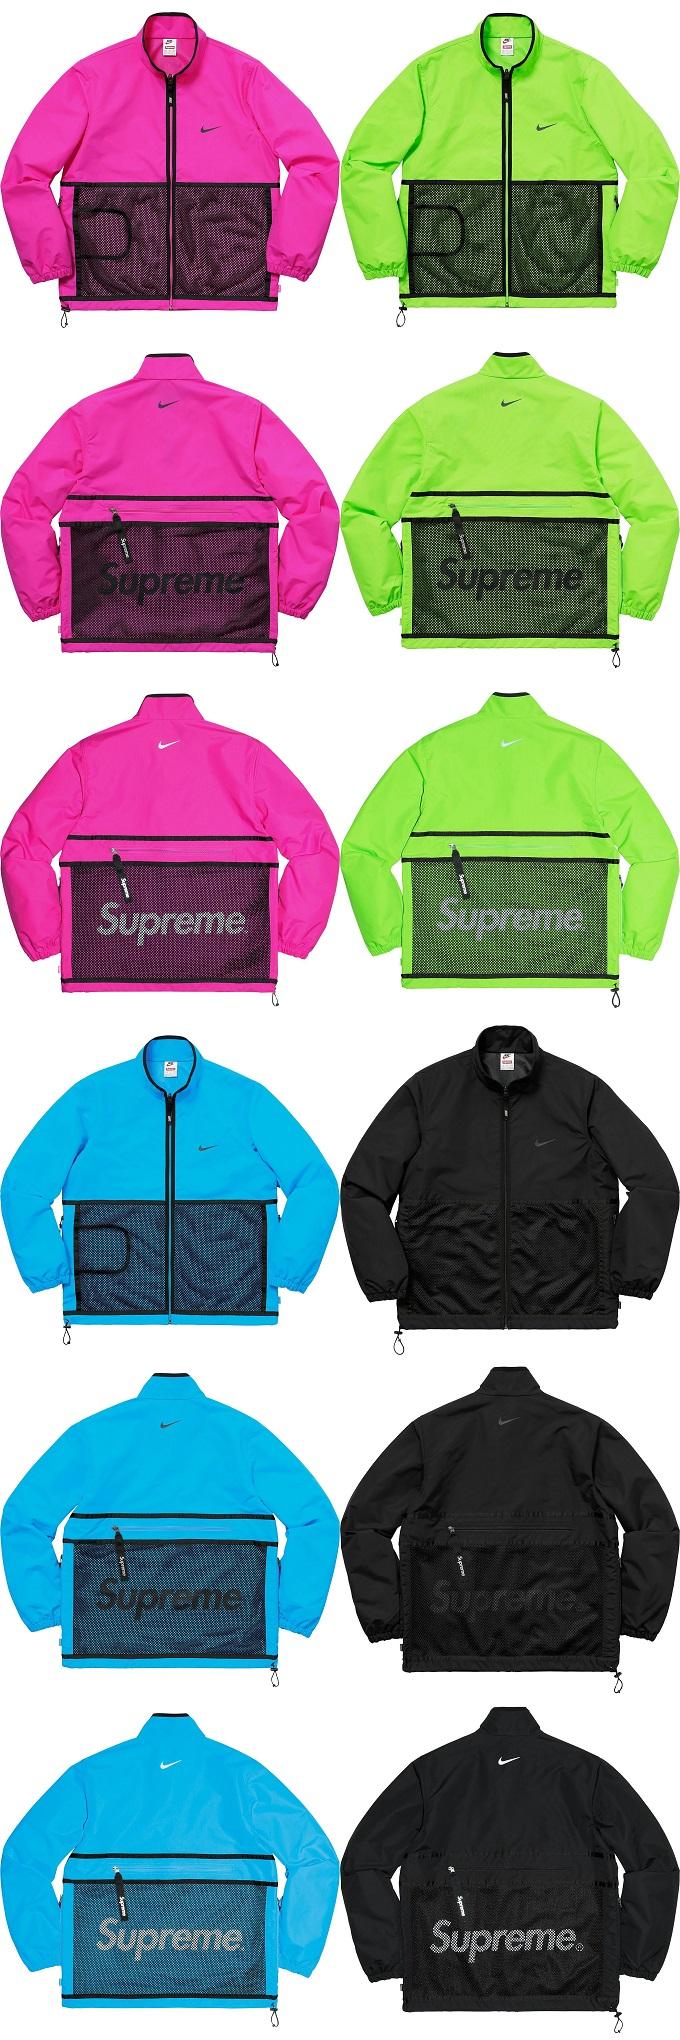 supreme-nike-lab-trail-running-jacket-pant-hat-release-20171028